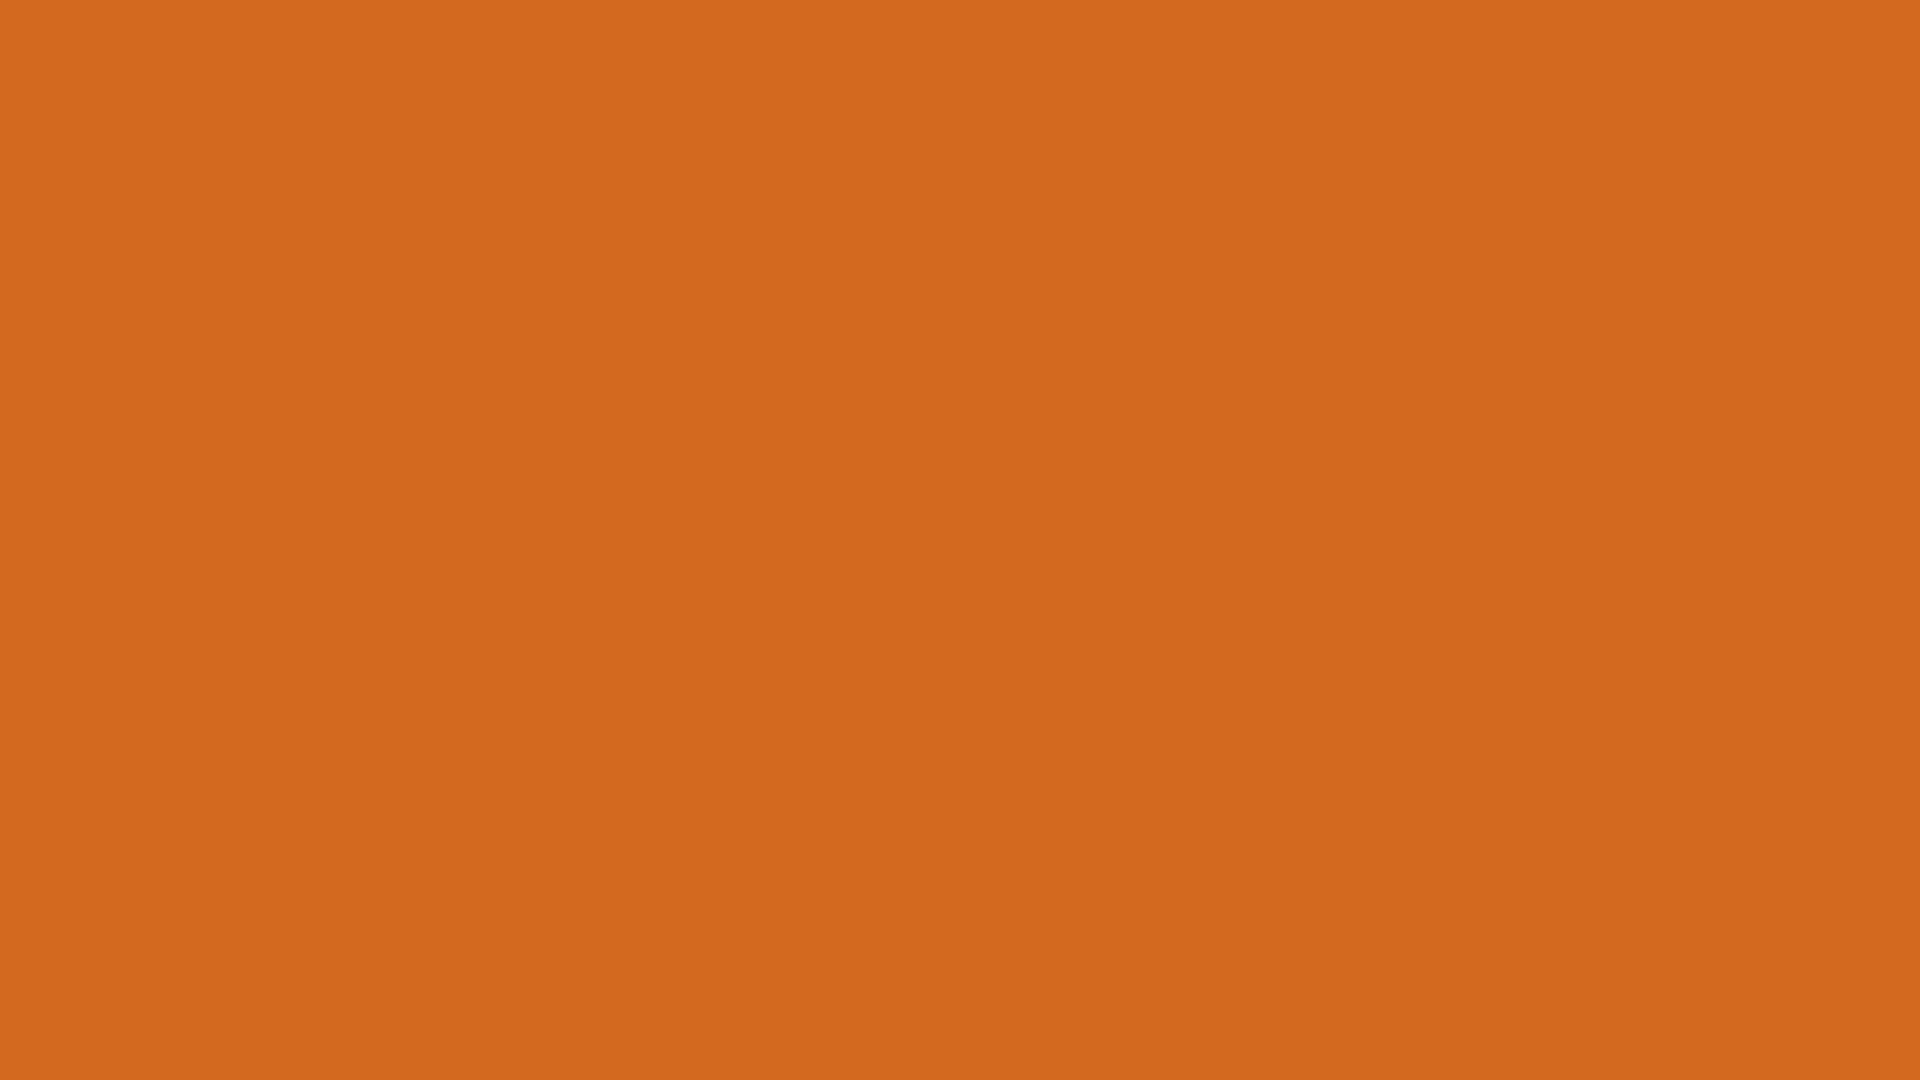 1920x1080 Cinnamon Solid Color Background